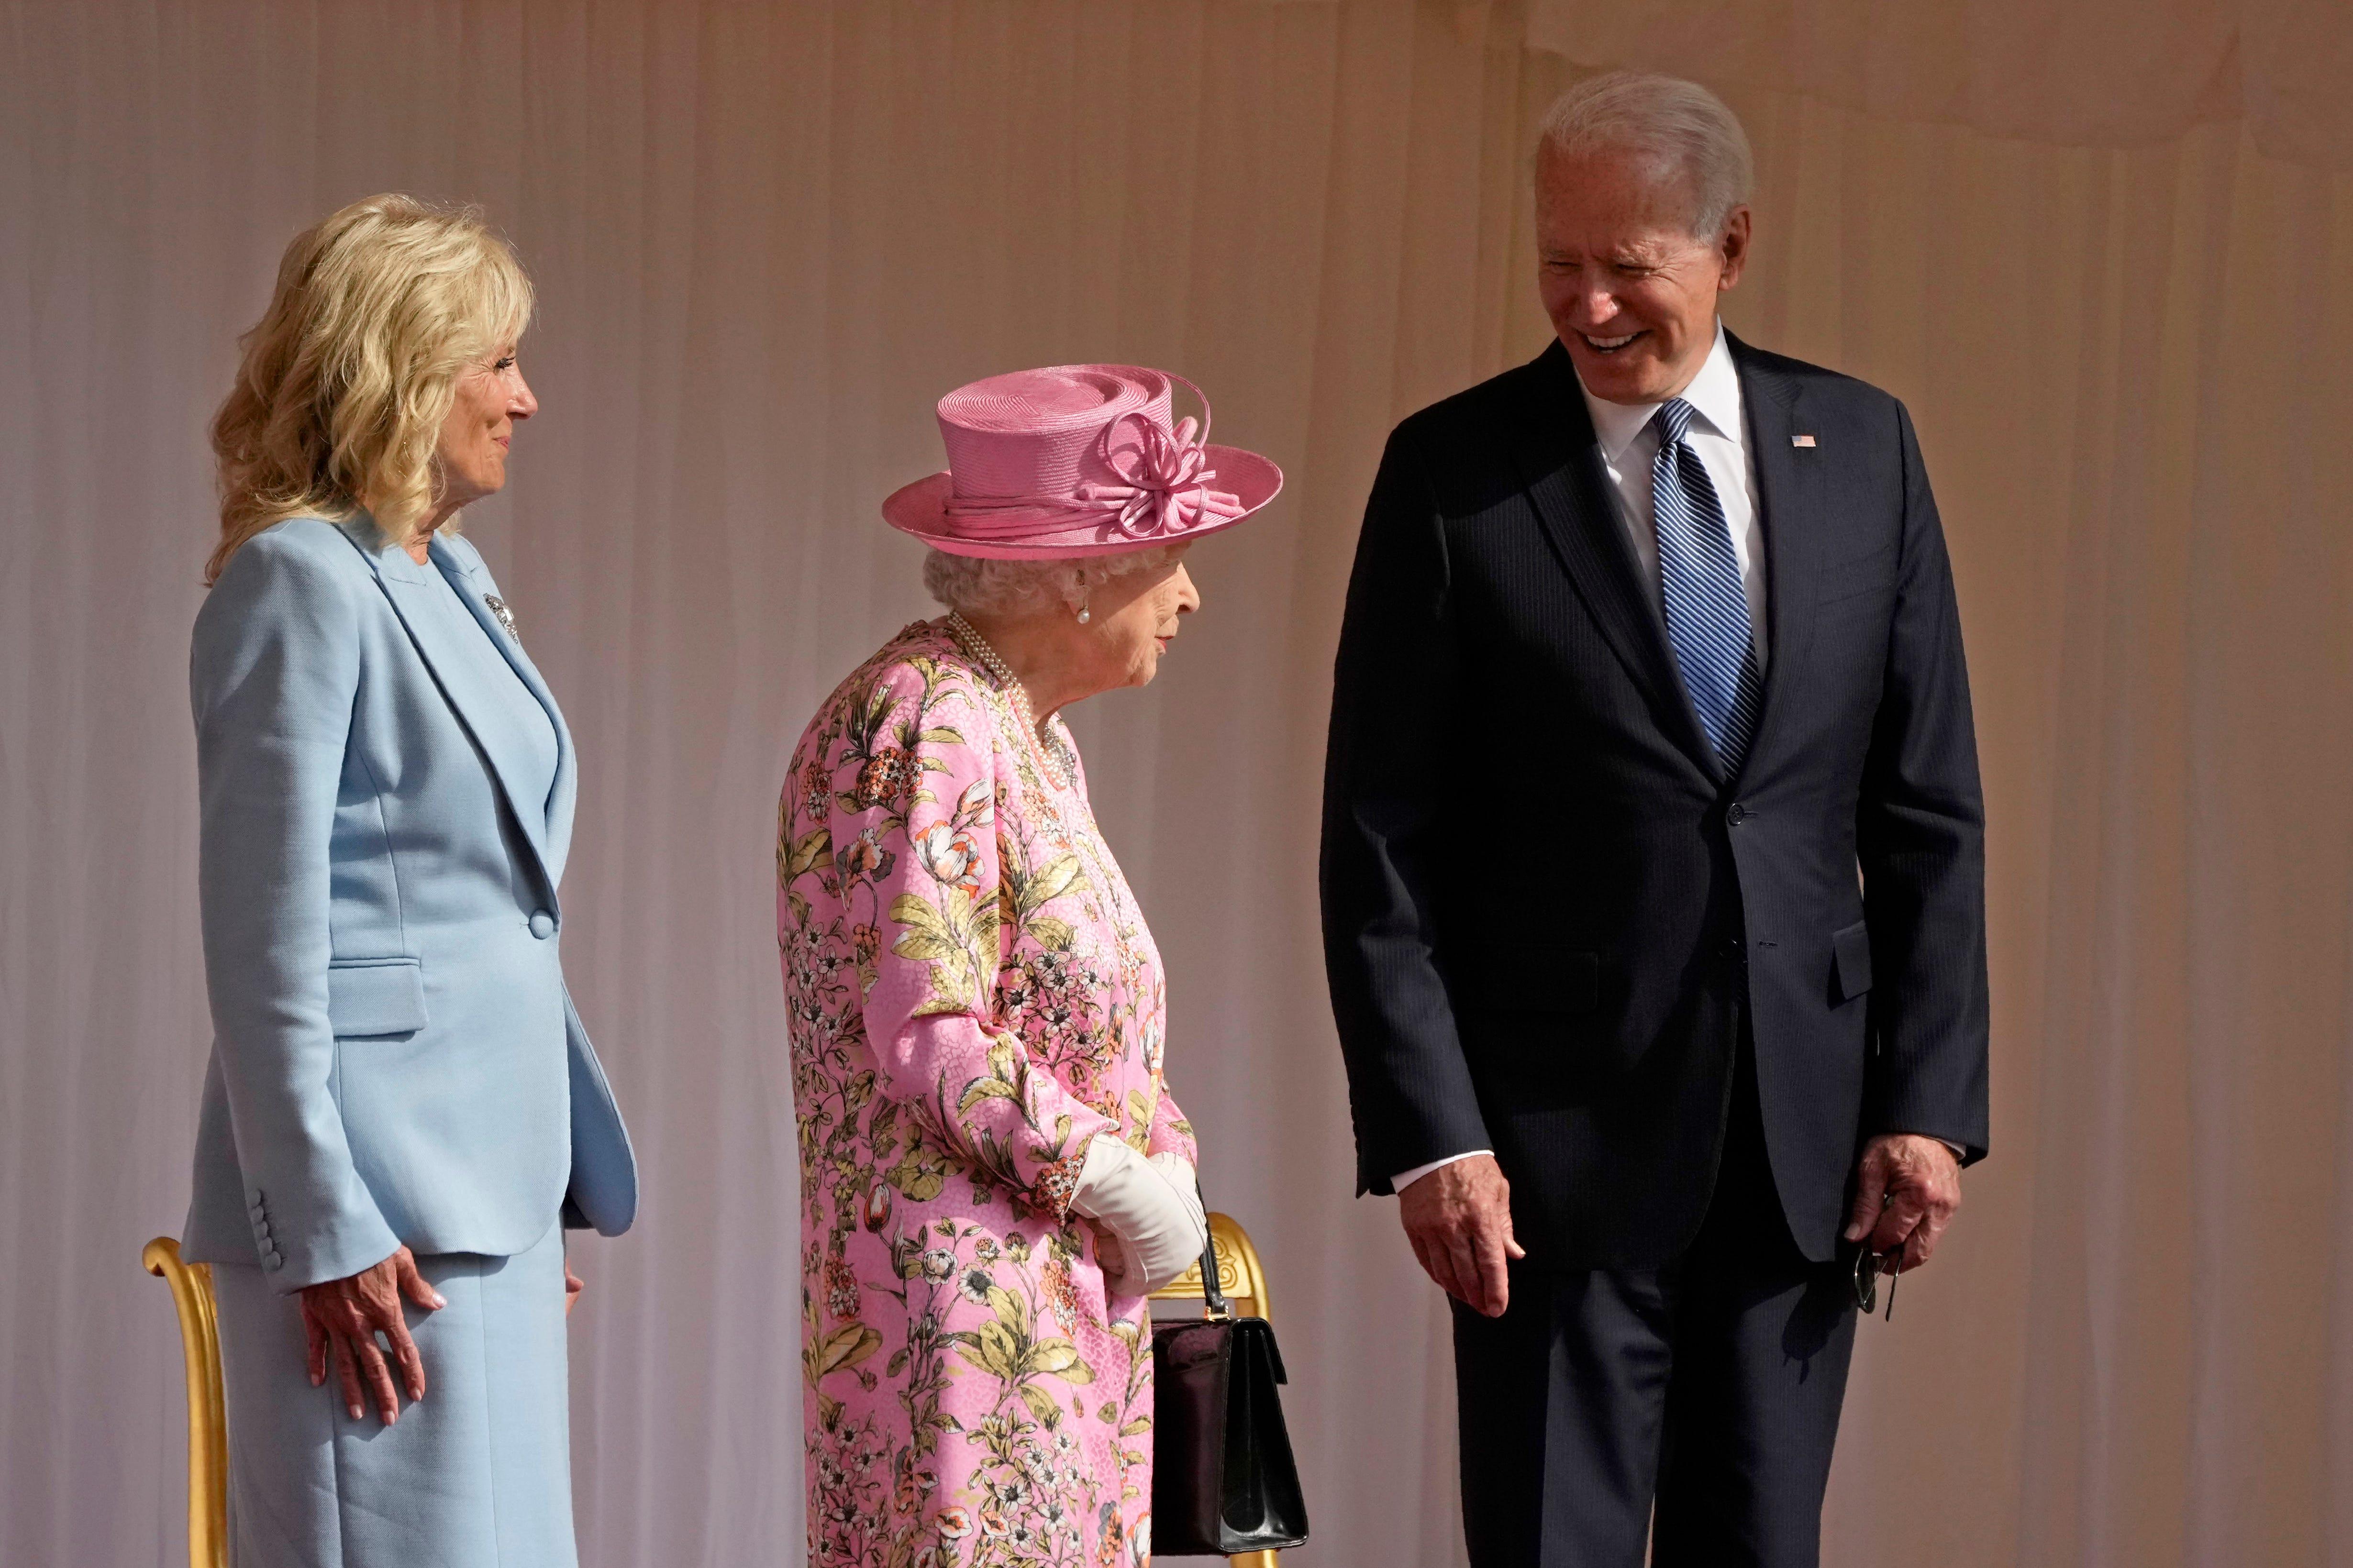 Queen Elizabeth II welcomes President Joe Biden and wife Jill for tea